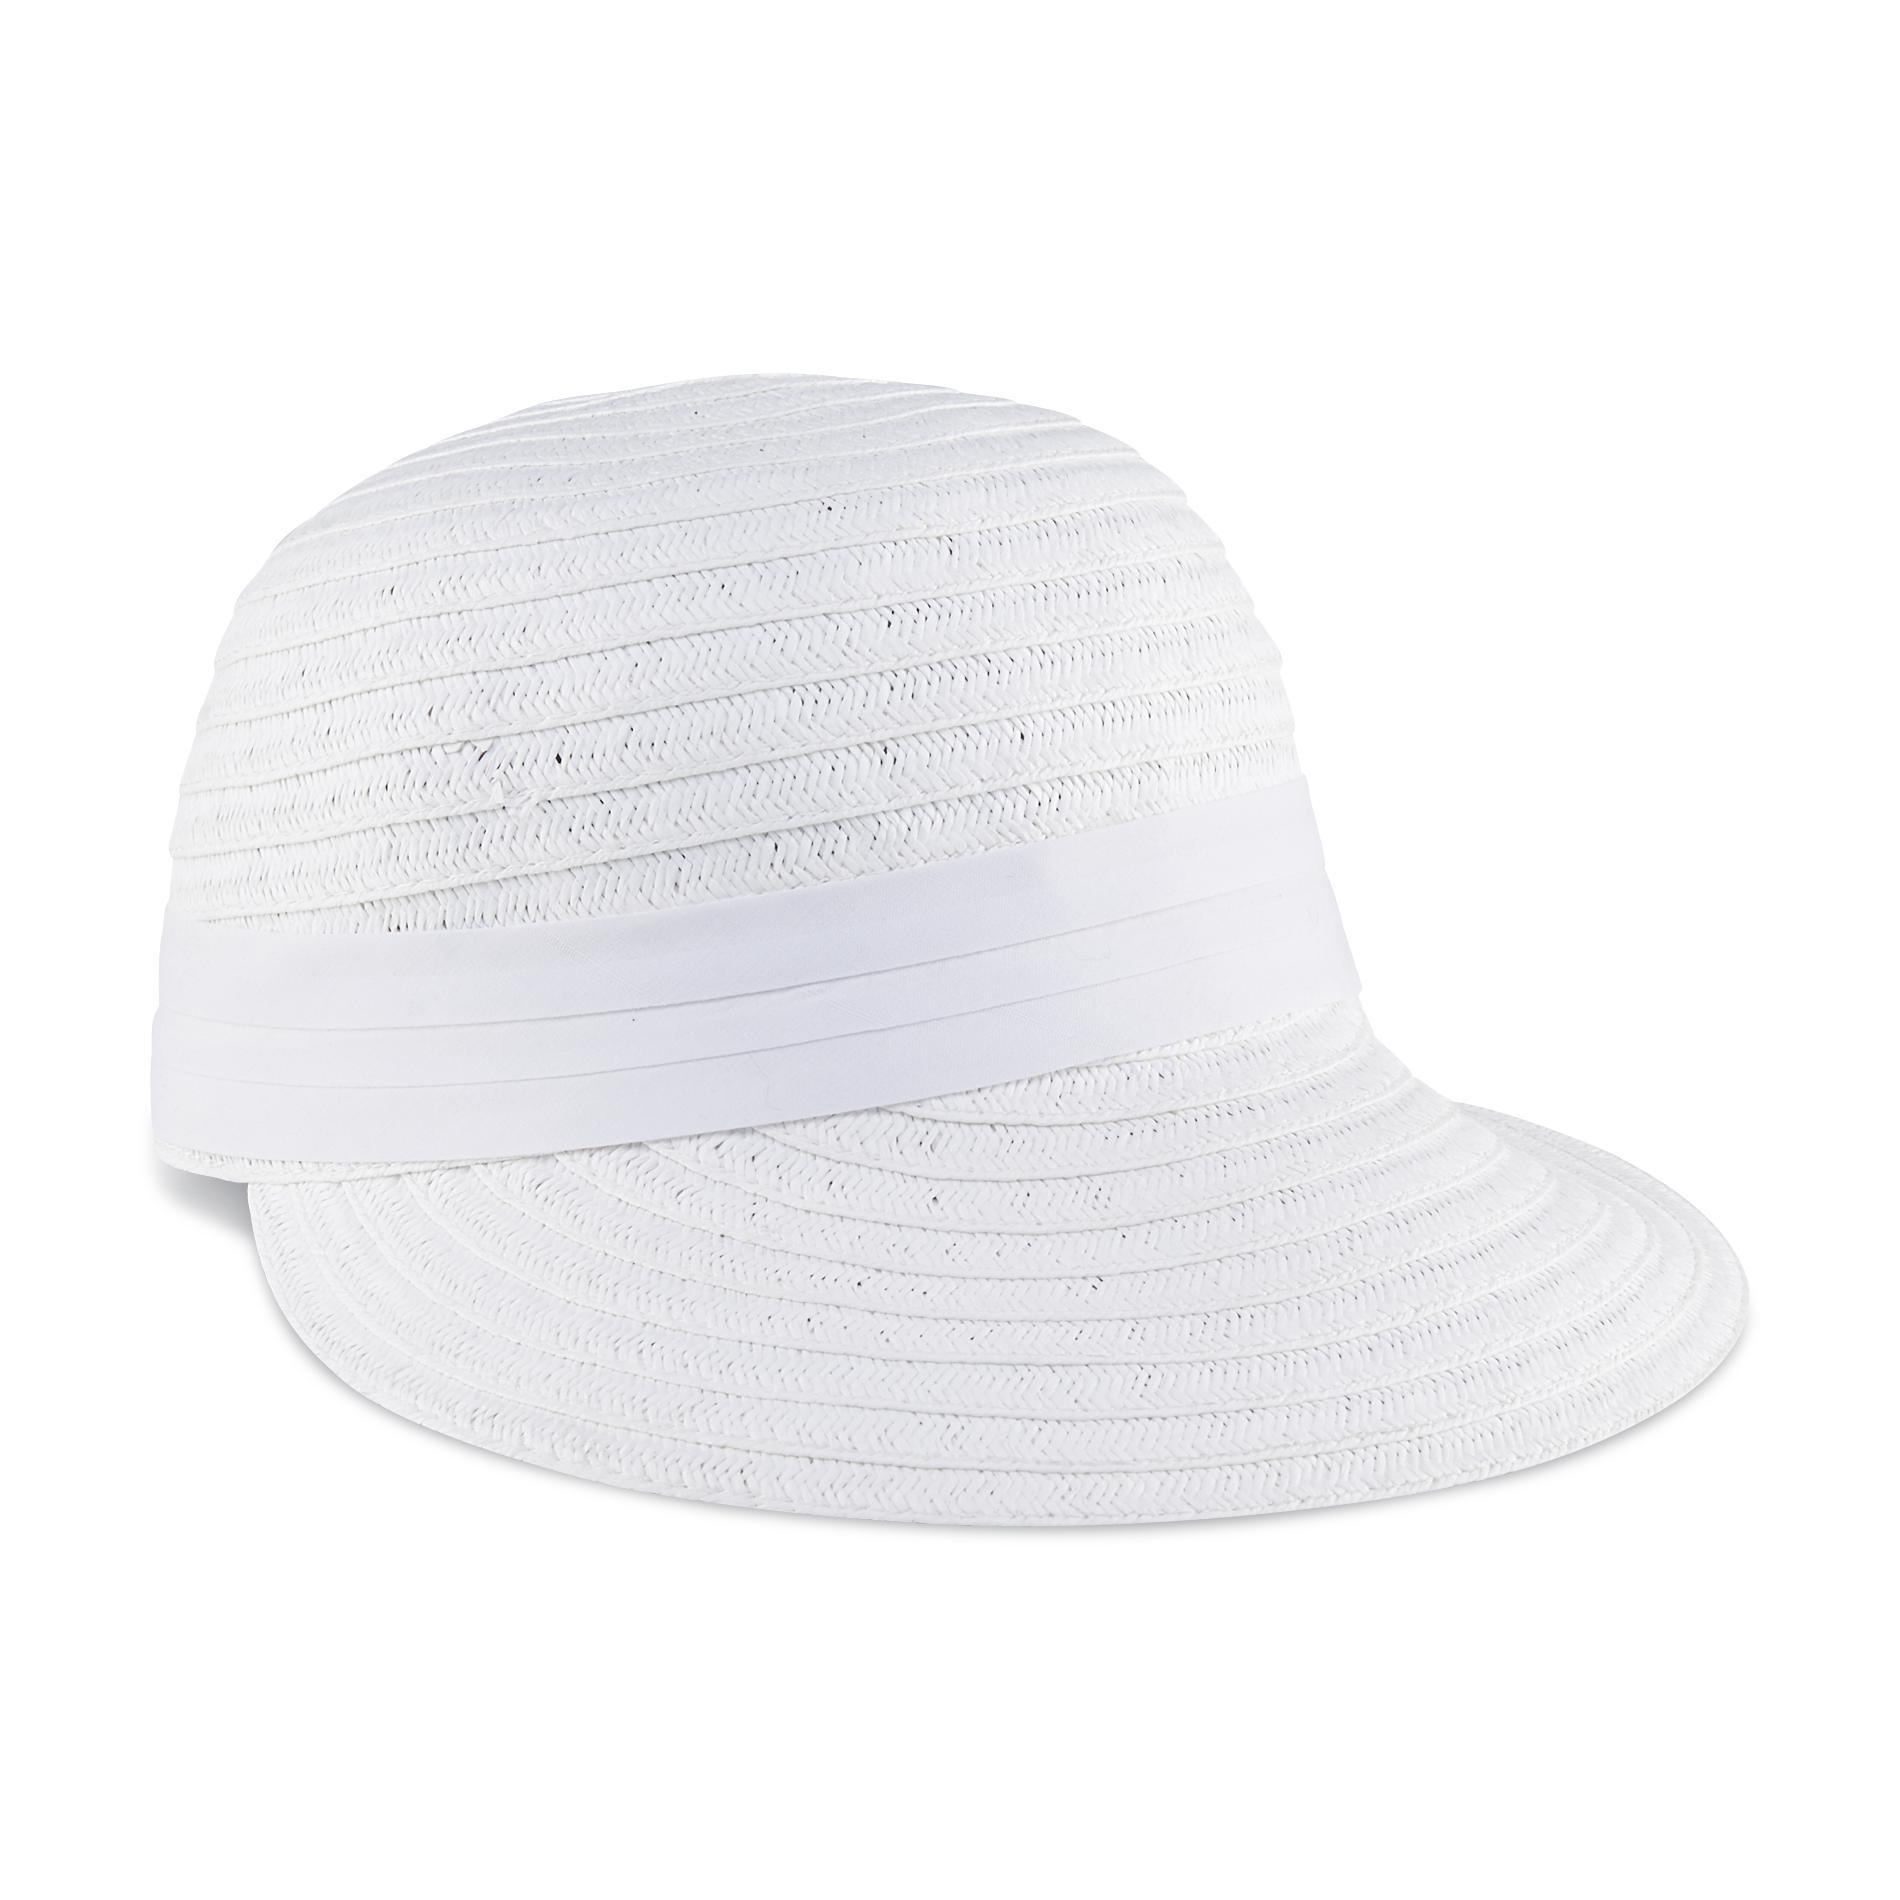 Basic Editions Women's Straw Face Framer Hat